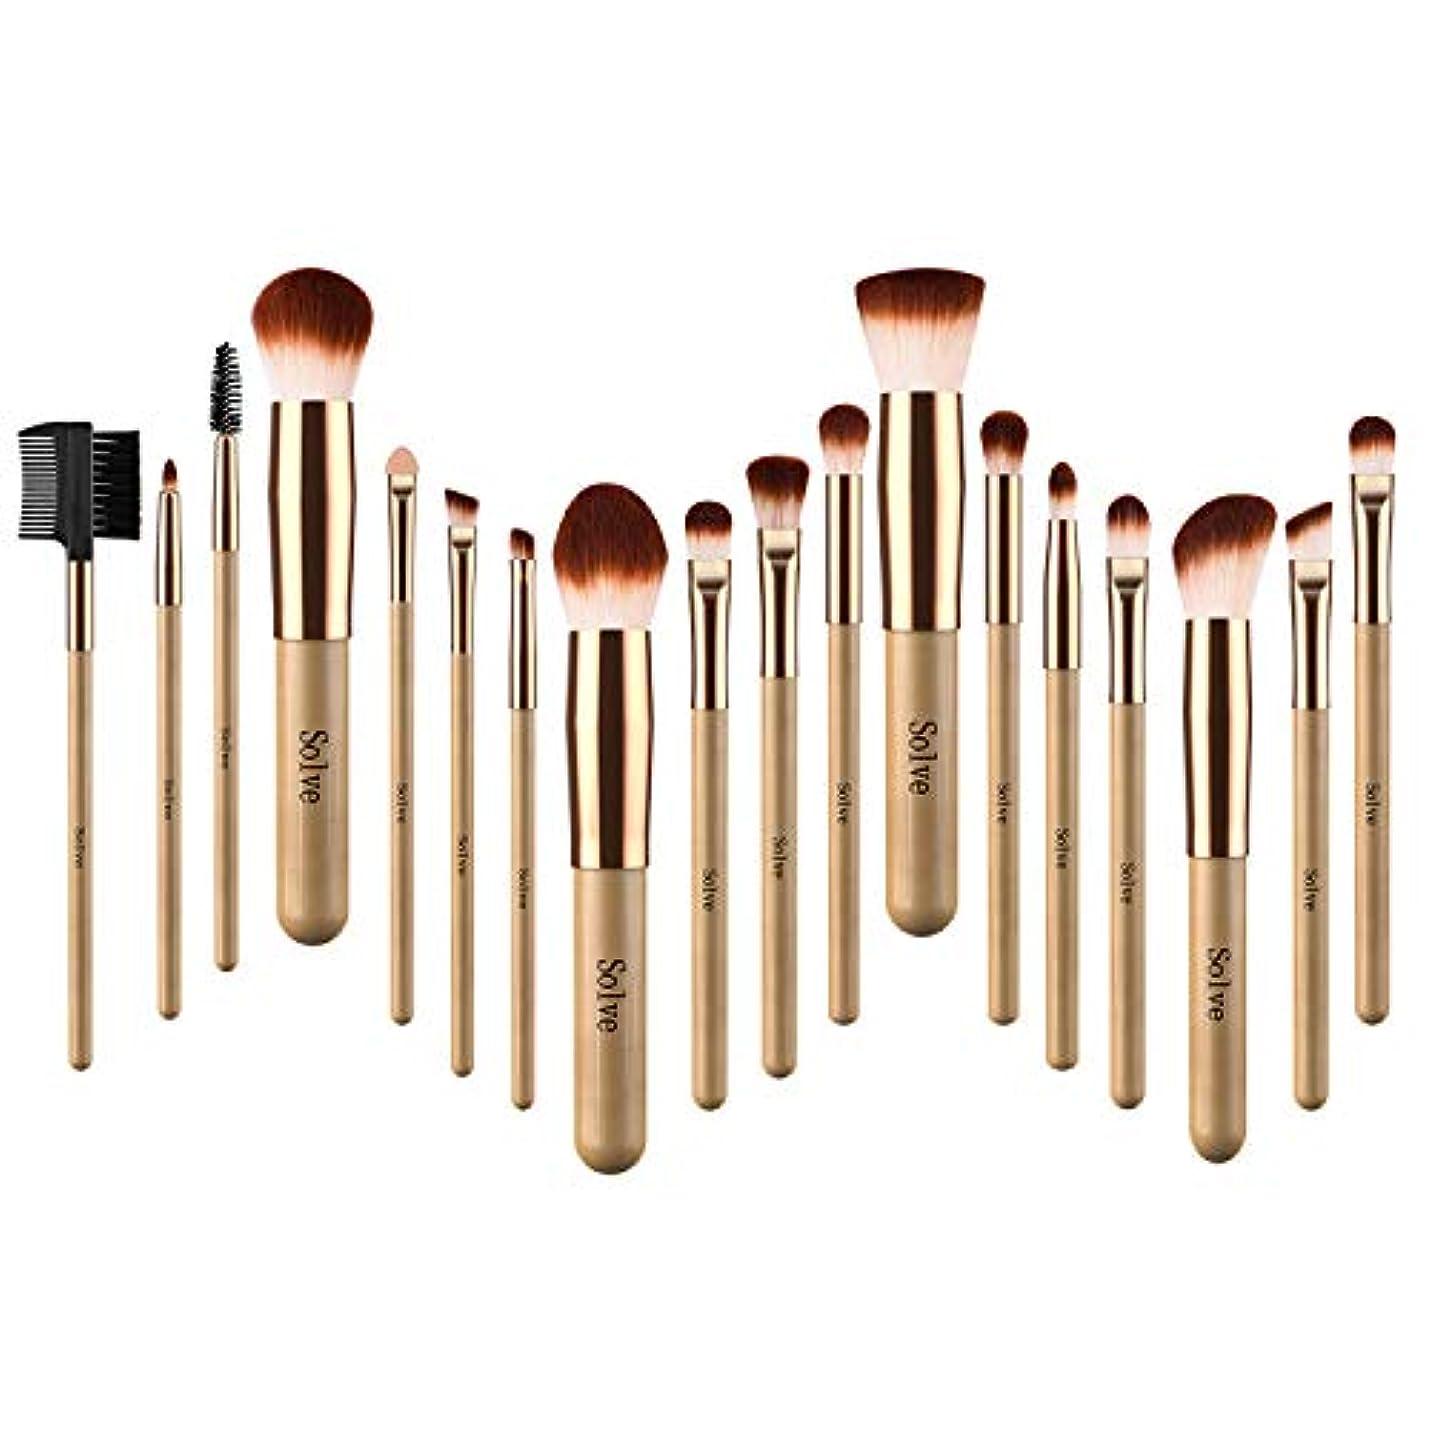 SOLVE メイクブラシ 18本 木製 化粧筆 柔らかい化粧ブラシ 旅行用セット メイク道具